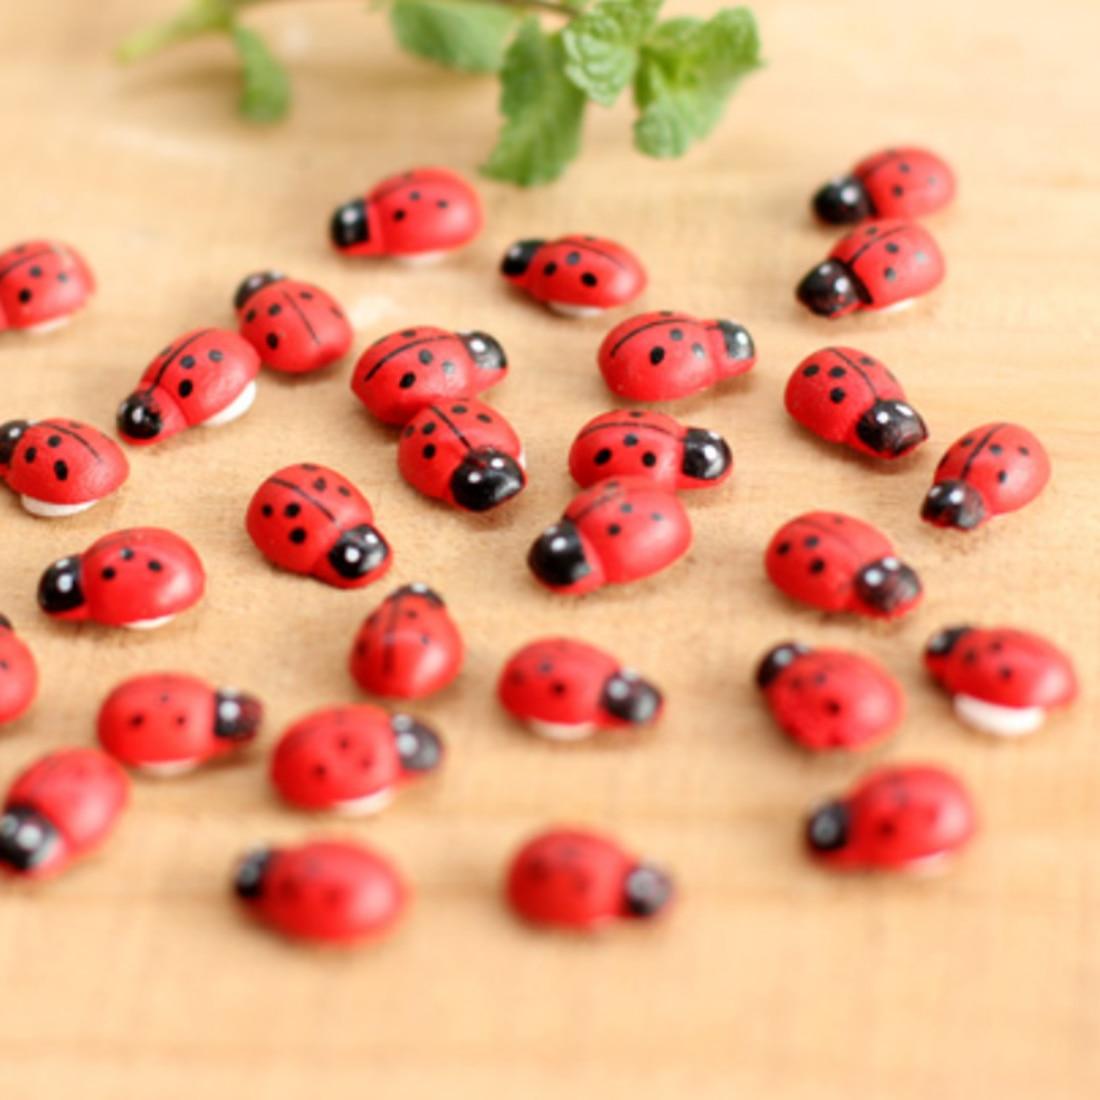 Ladybug ornaments - 10pcs Adorable Wooden Ladybird Ladybug Sponge Sticker Adhesive Craft Home Garden Ornaments Party Decorations Red